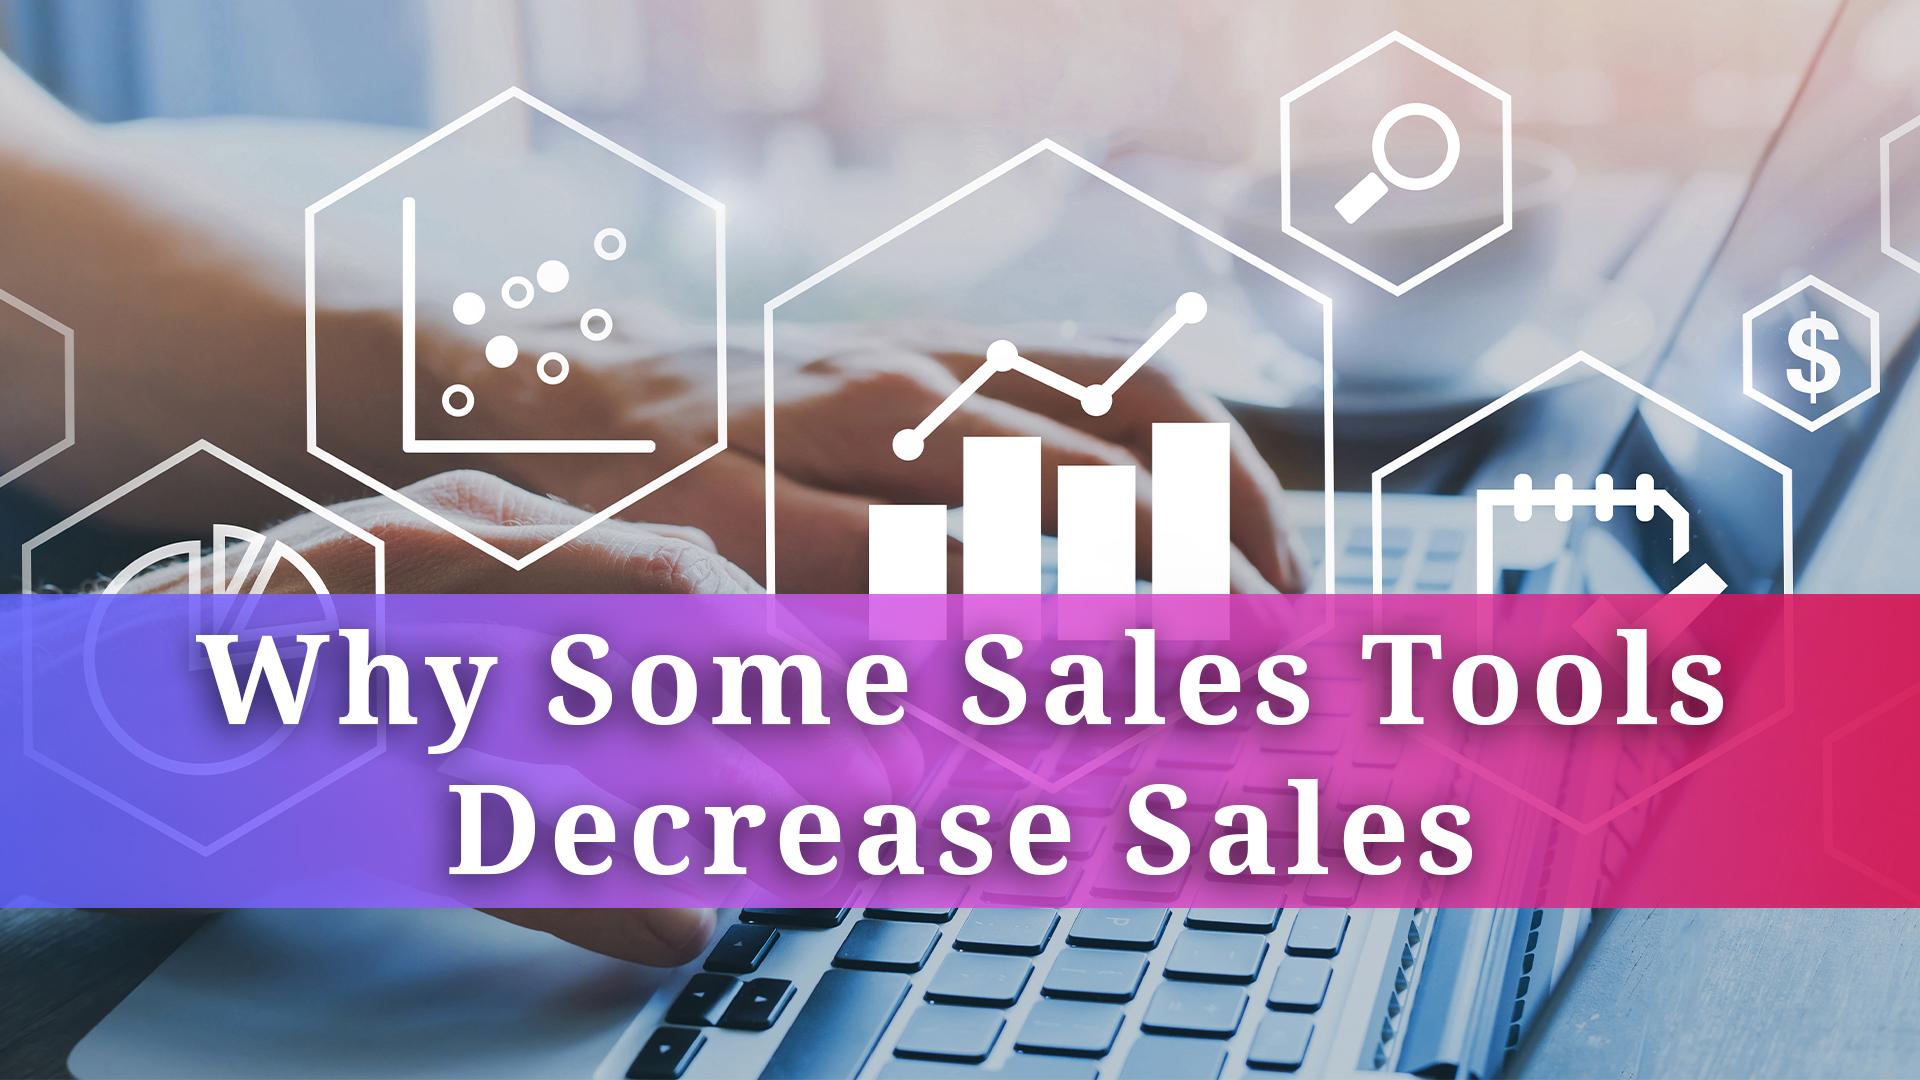 Why Some Sales Tools Decrease Sales